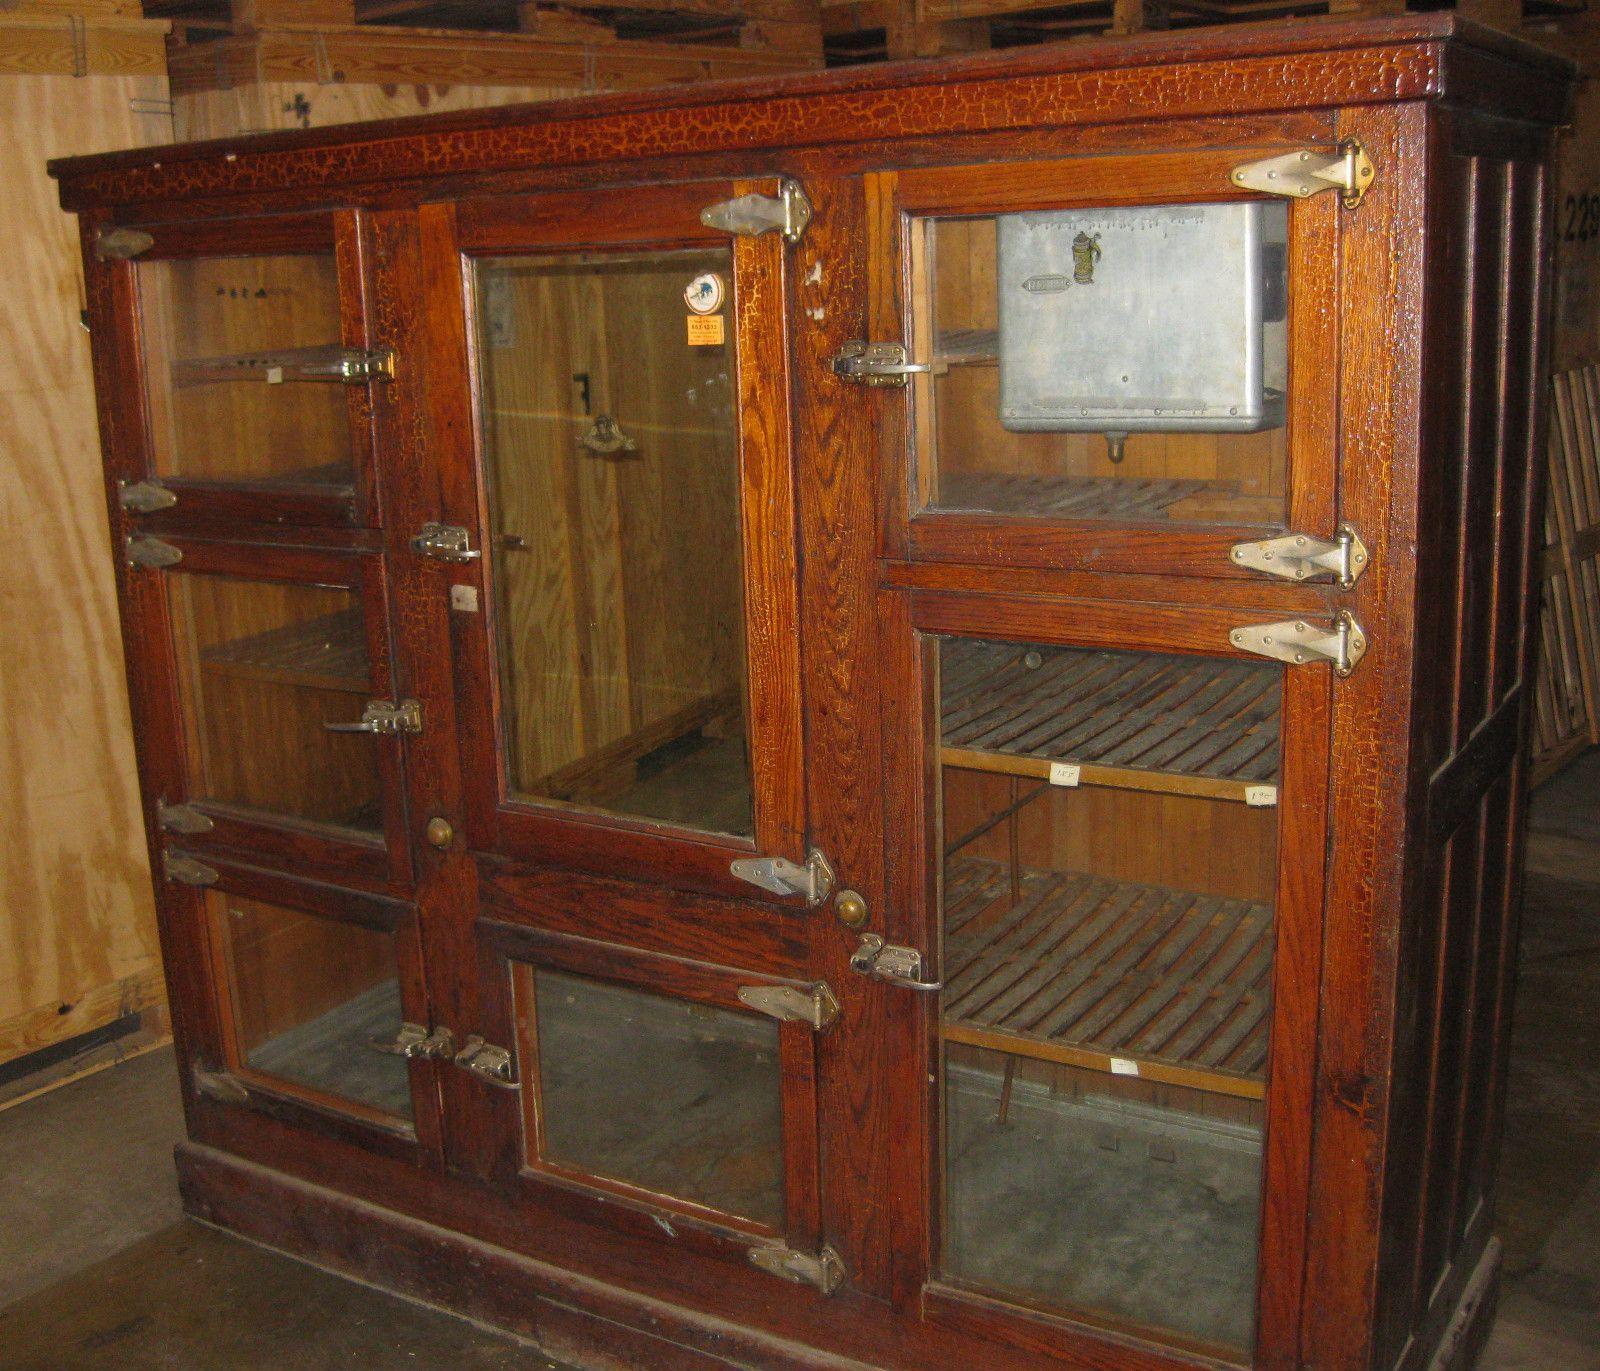 Country Kitchen Fridge: Icebox Refrigerator - Google Search